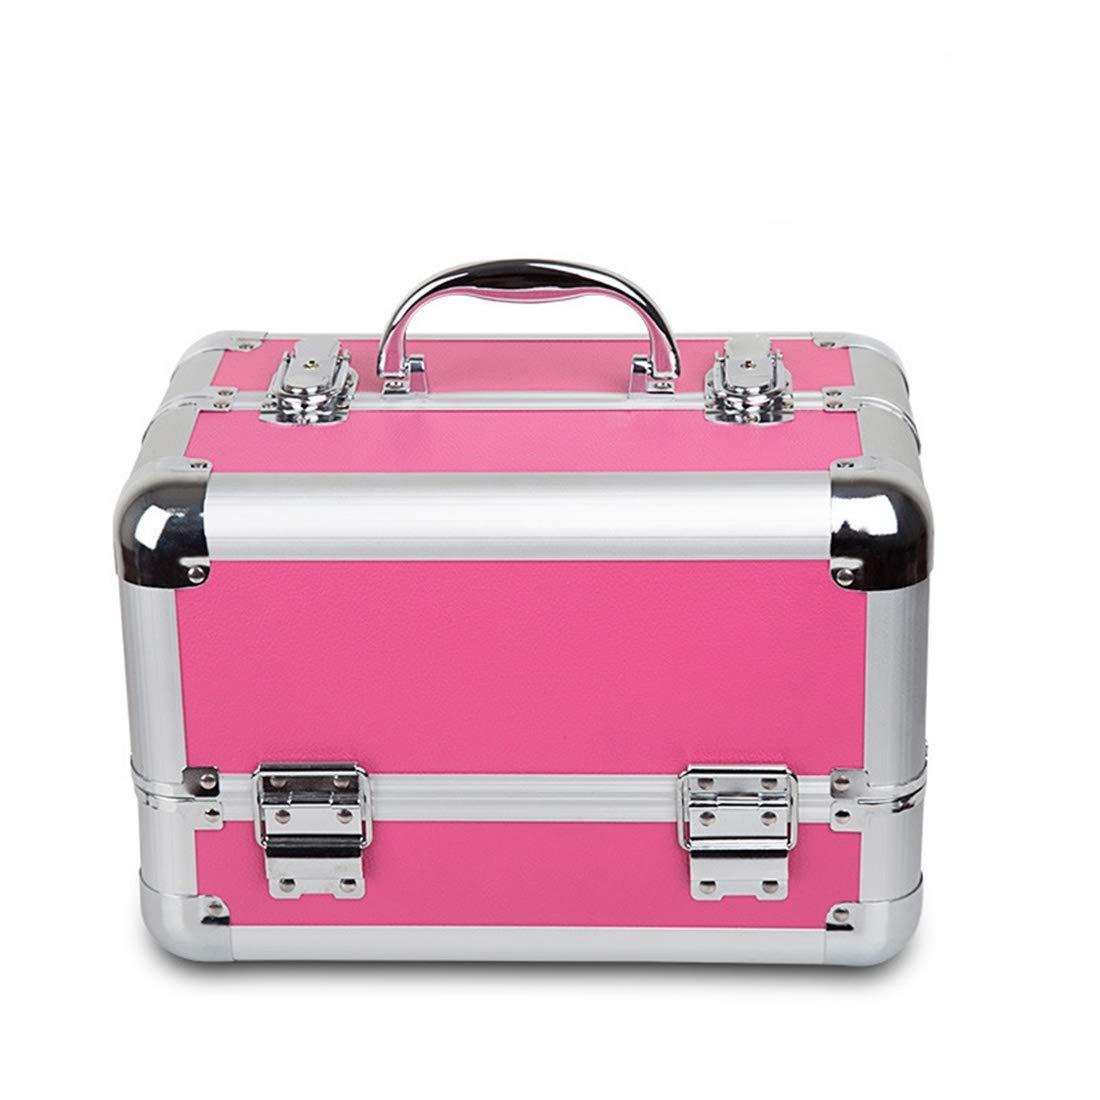 FELICIAAA エクストラ大容量倉庫美容ボックスメイクアップネイルジュエリー美容ドレッサーバニティケースピンク (Color : ピンク) B07NW4ZNGX ピンク